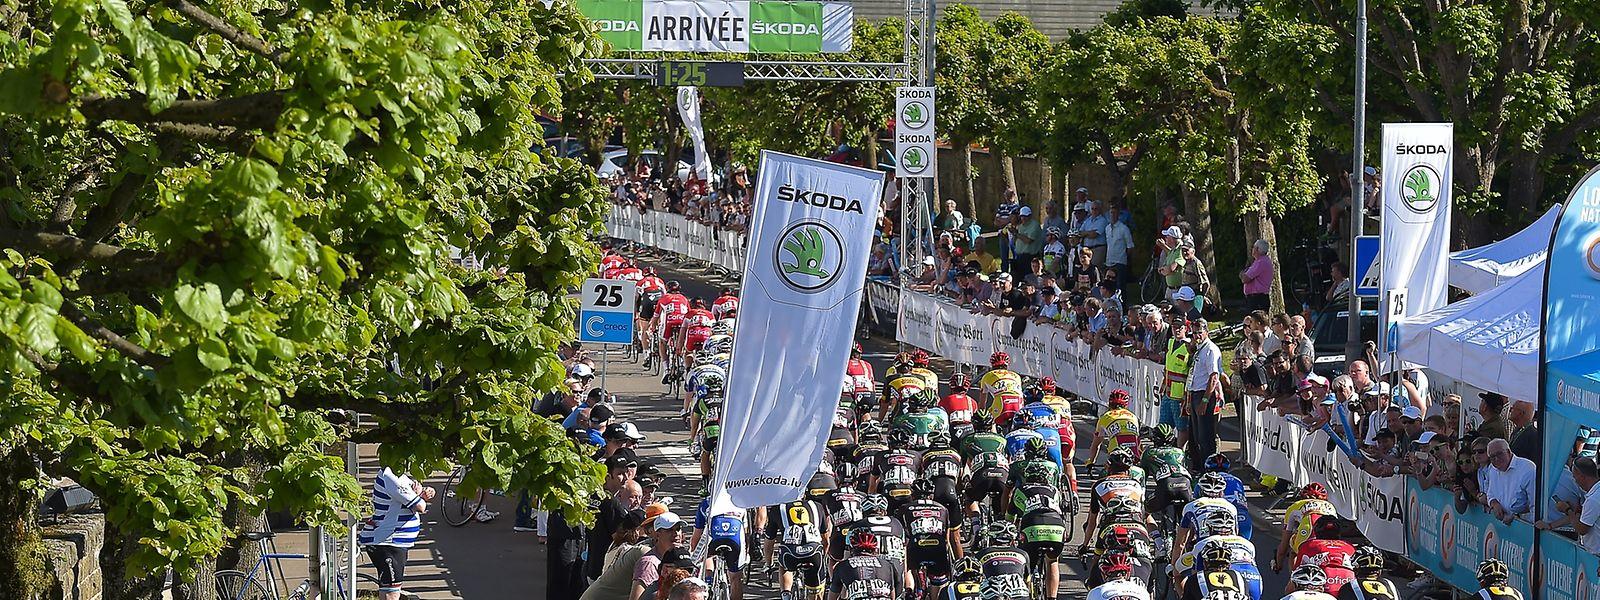 Bei der SkodaTour de Luxembourg werden künftig weniger Fahrer an den Start gehen.